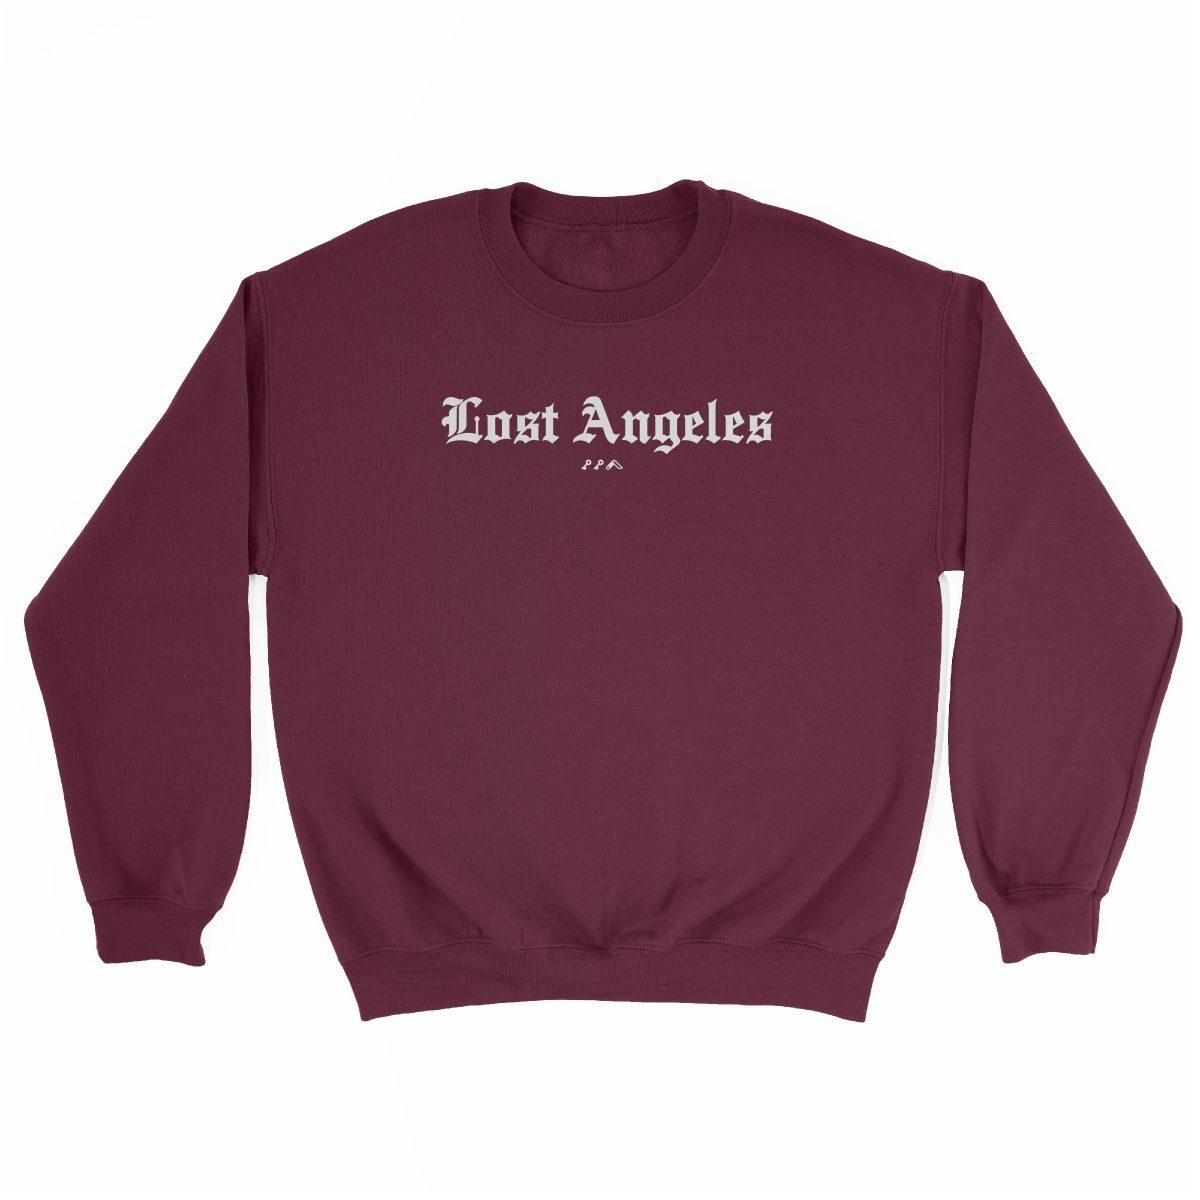 """Lost Angeles"" soft sweatshirt in maroon by KIKICUTT"